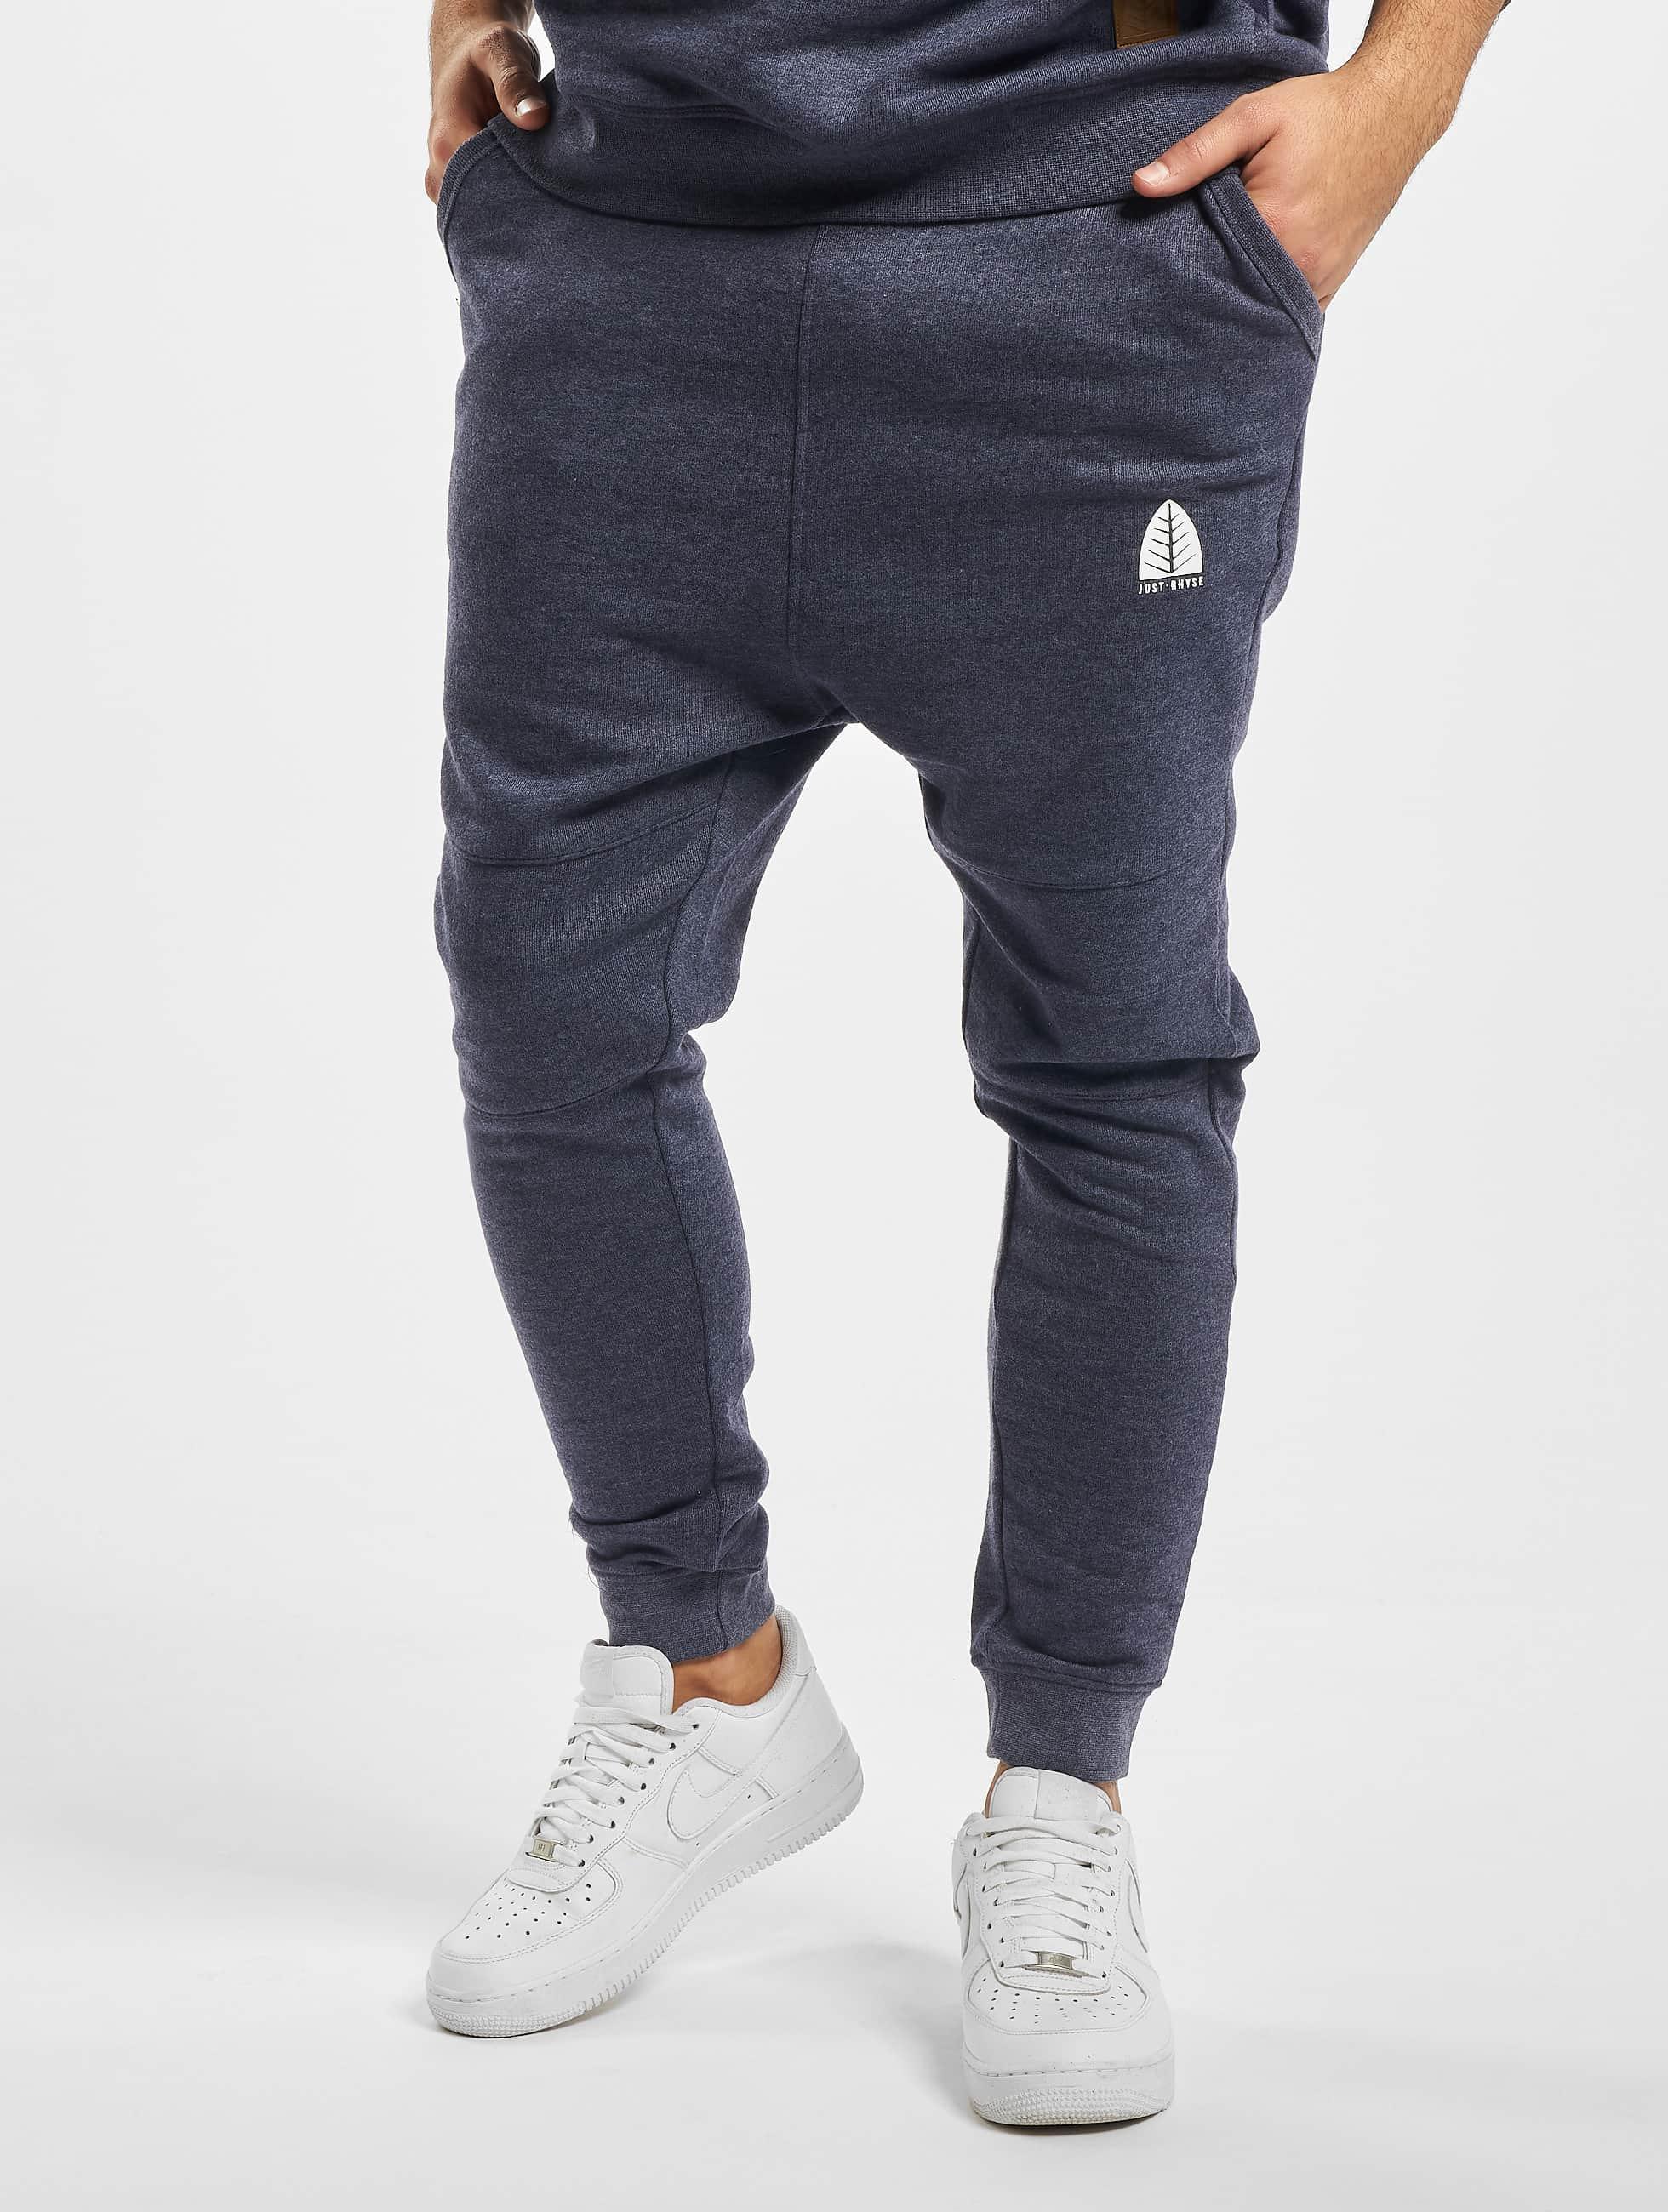 Just Rhyse / Sweat Pant Rainrock in blue XL